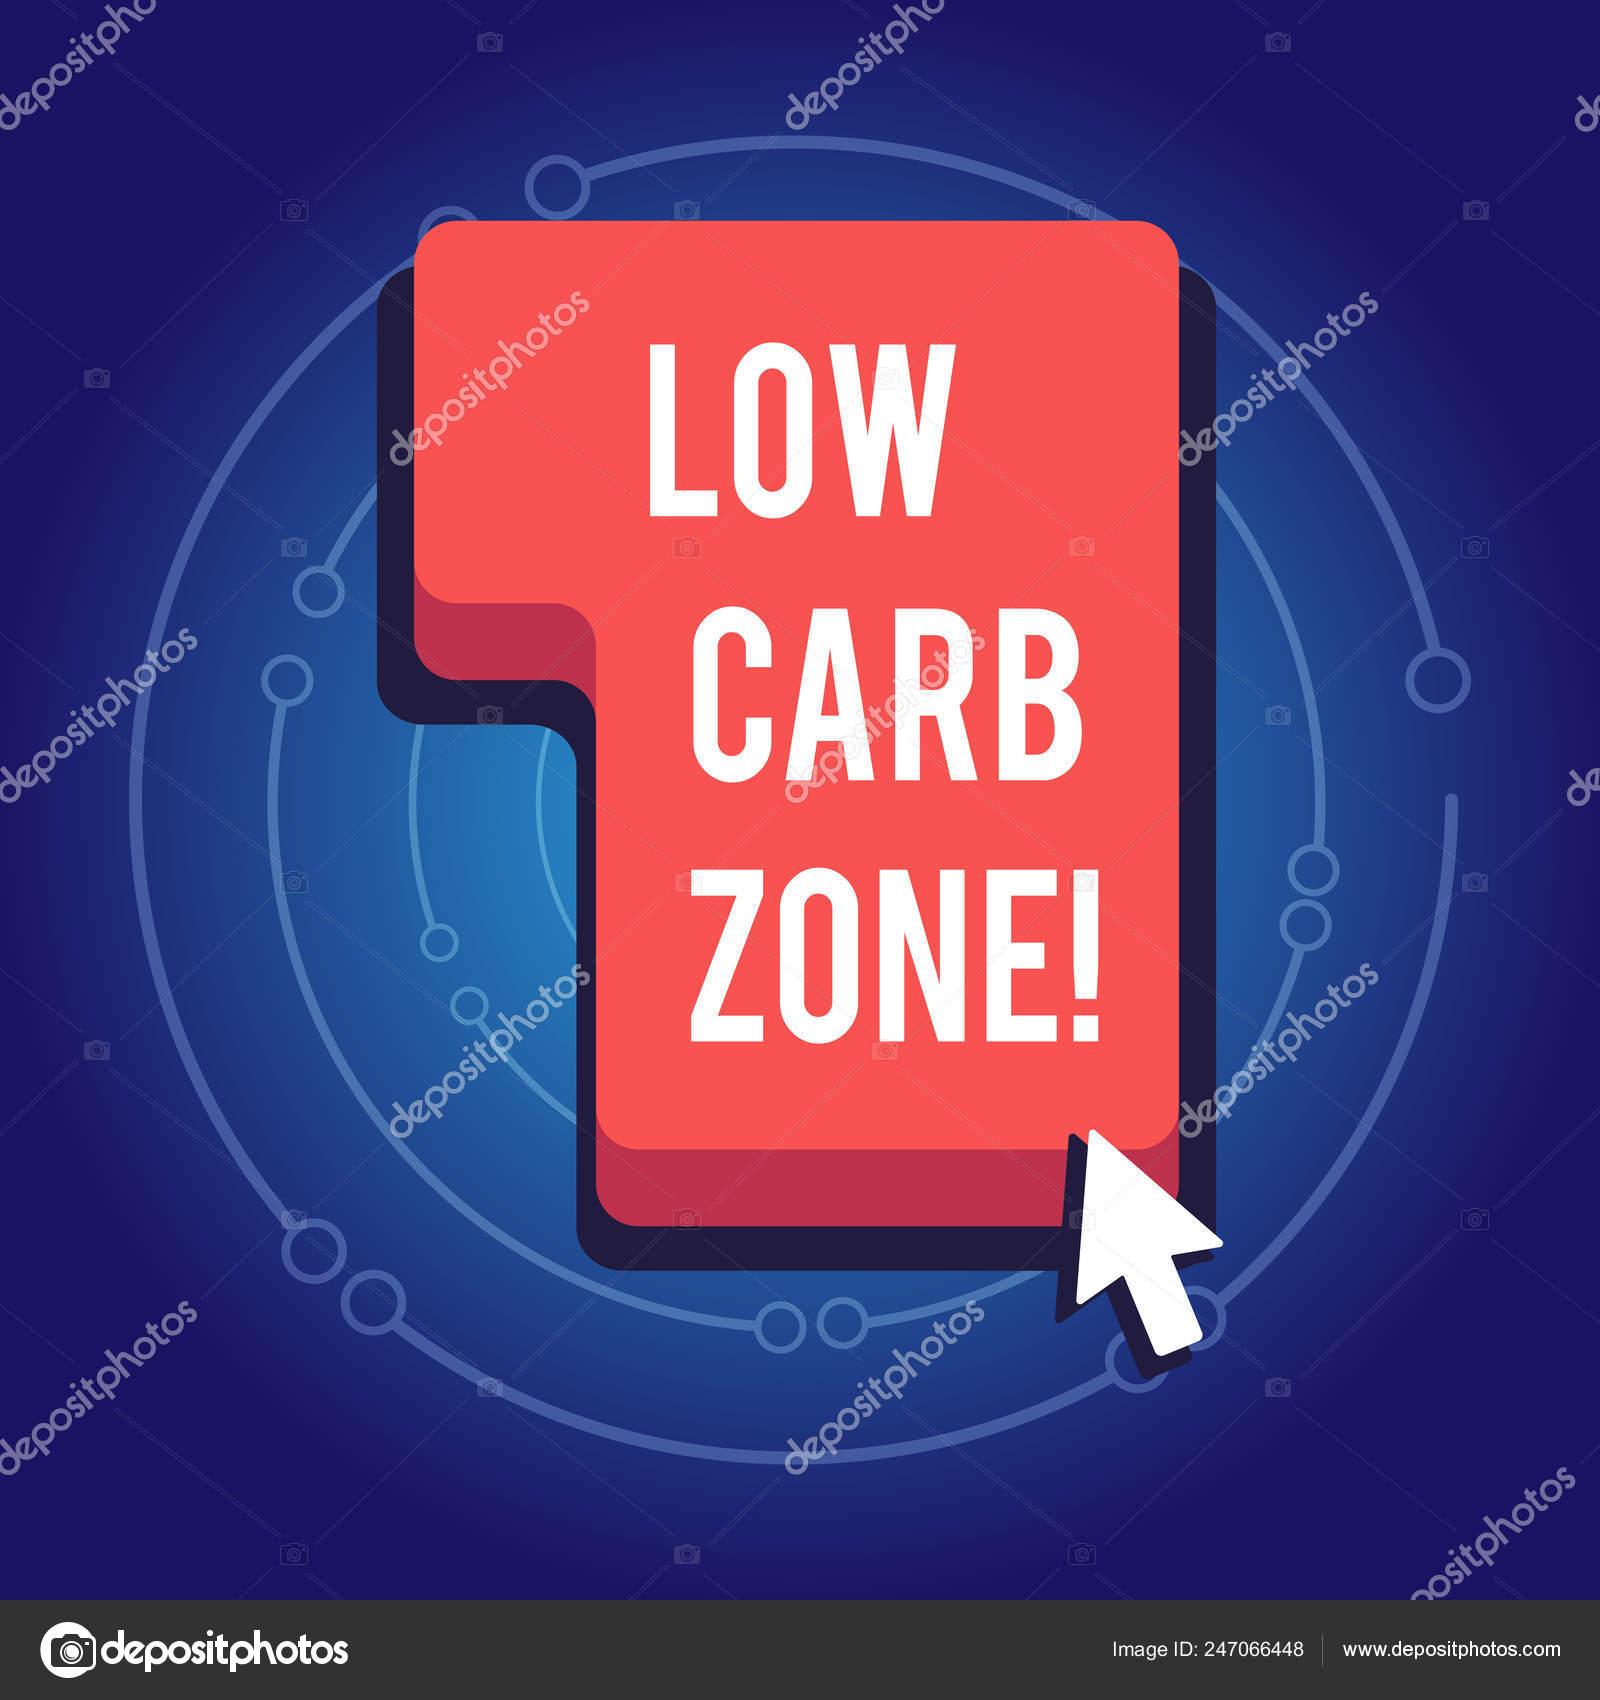 Dieta 1600 calorias baja en carbohidratos